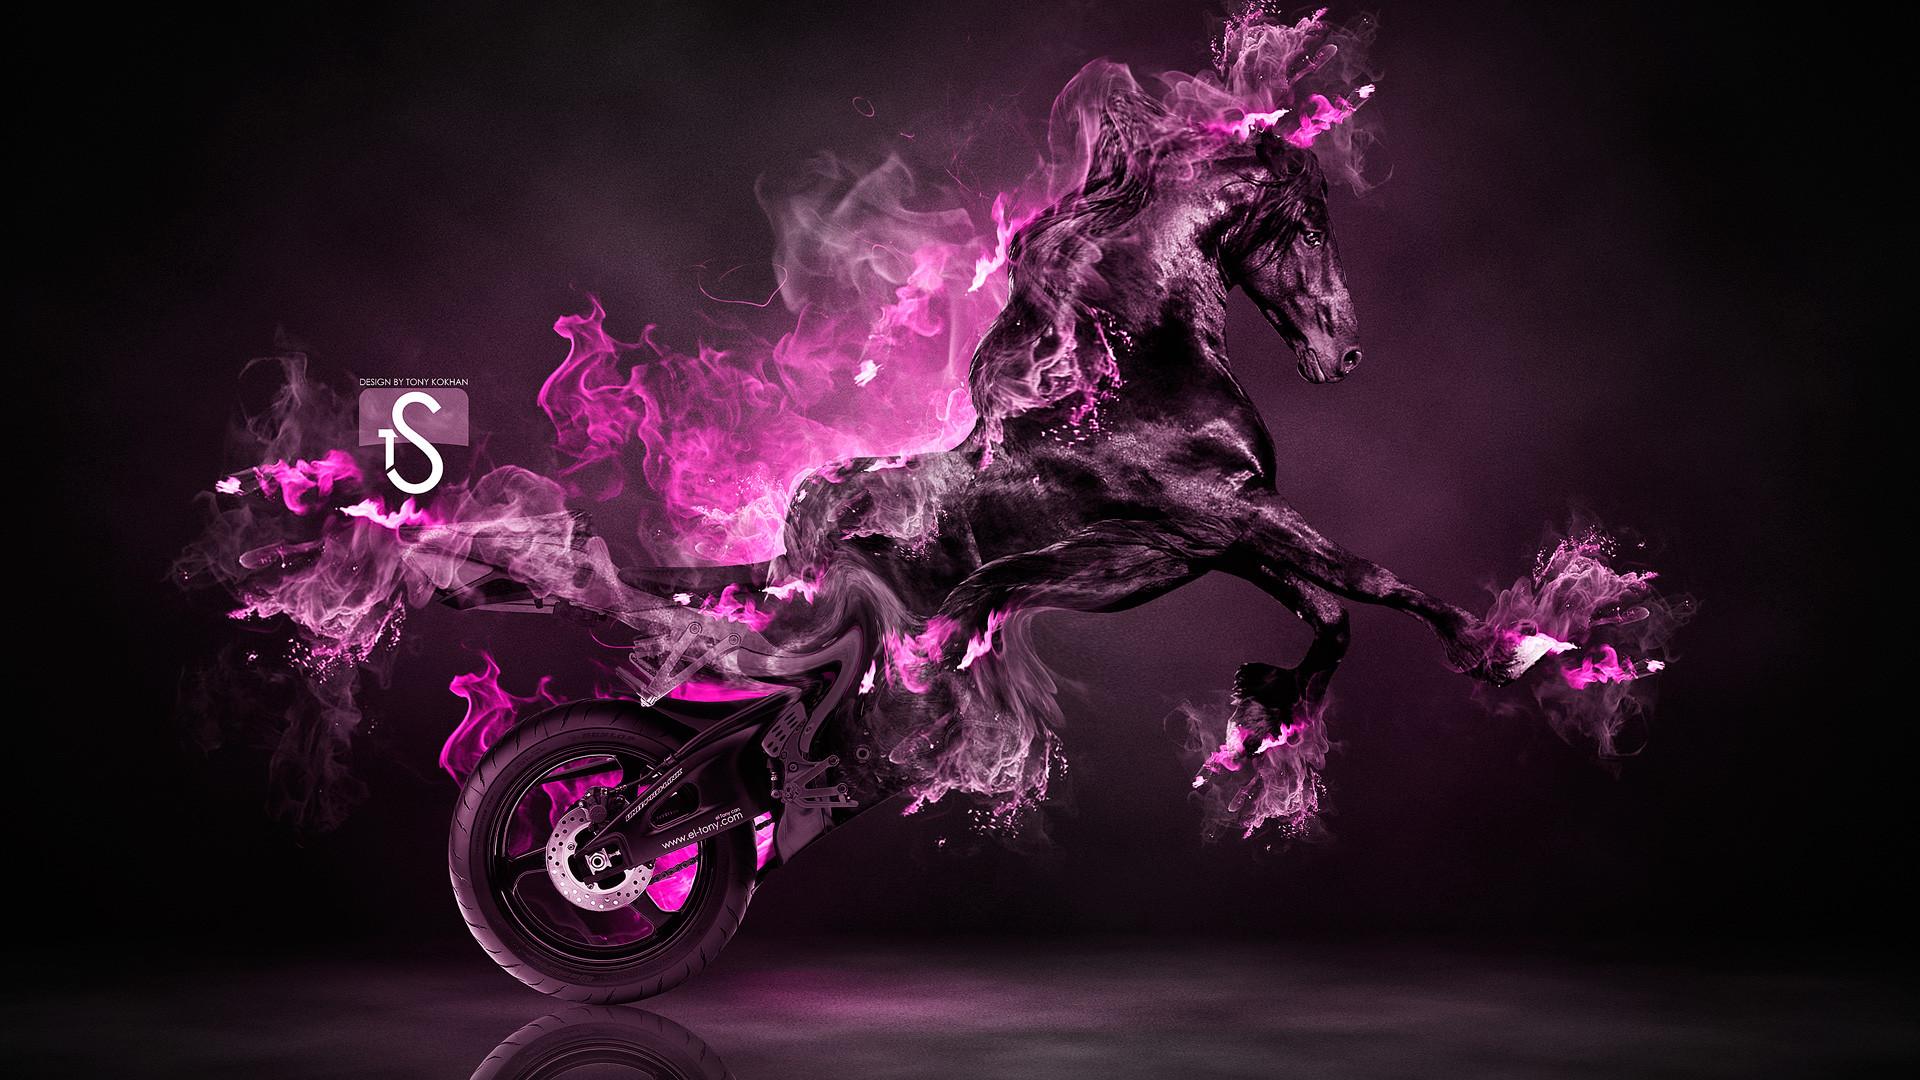 Incroyable 1920x1080 Fire Moto Fantasy Horse 2013 Â« El Tony